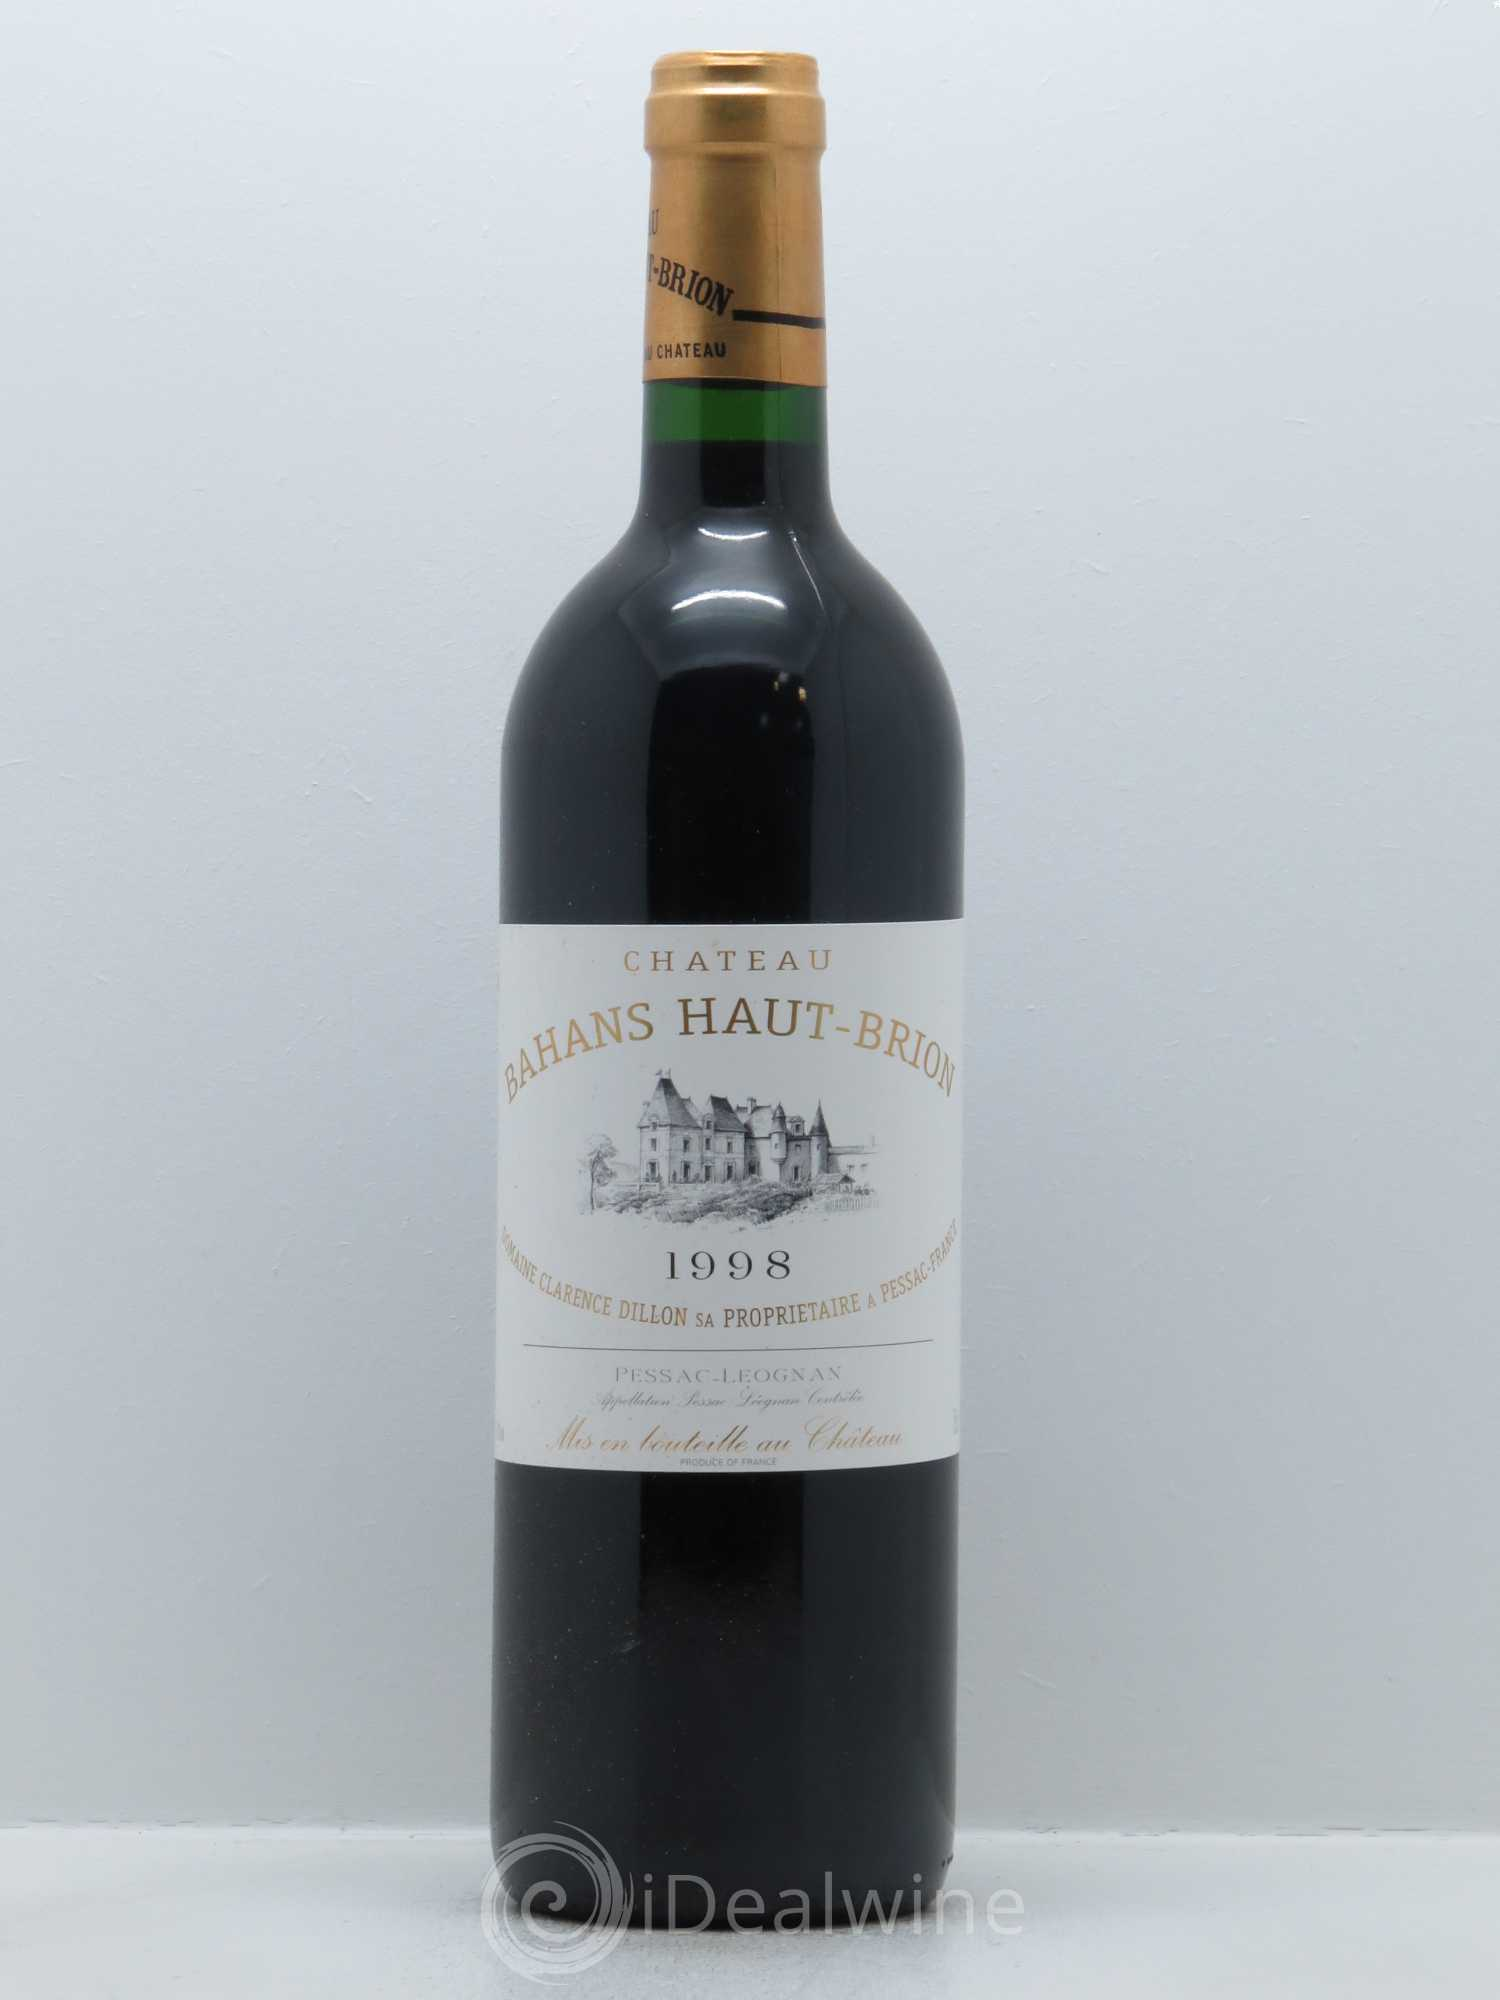 Buy ch teau clarence bahans de haut brion second vin for Buy chateaubriand